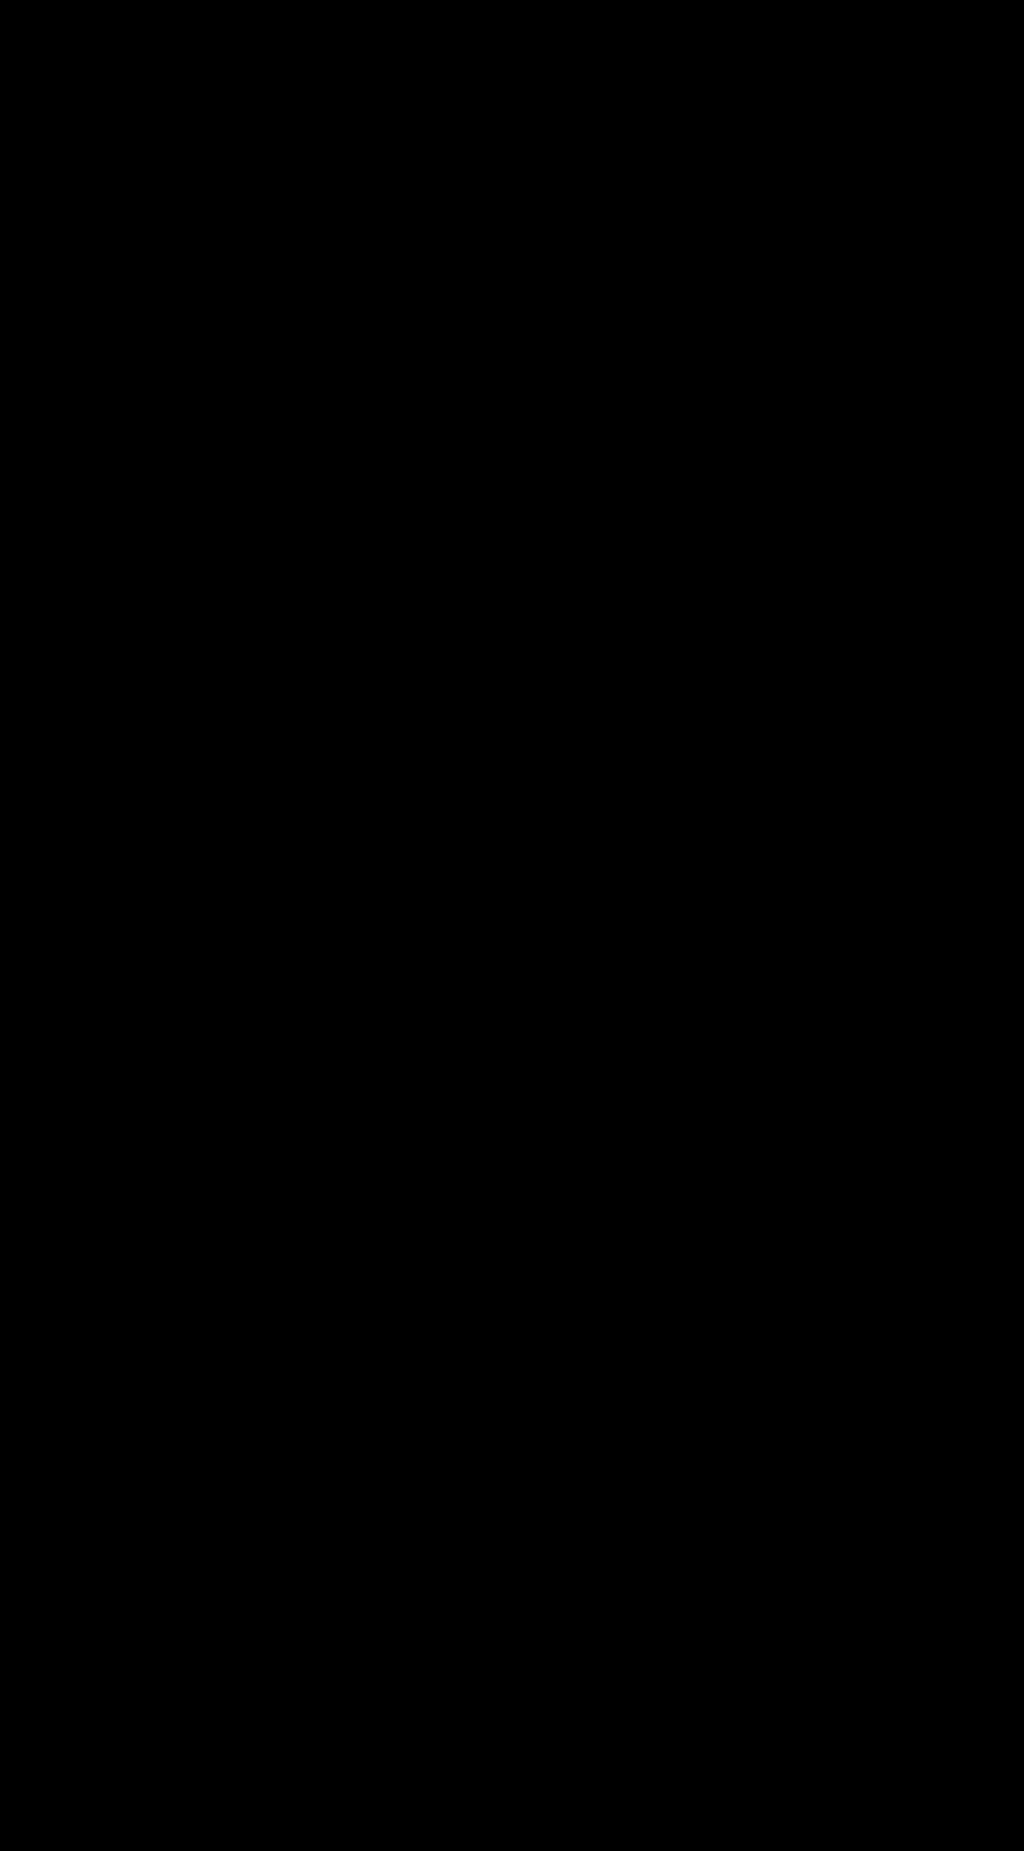 lost clock icon on blackberry vlFqe